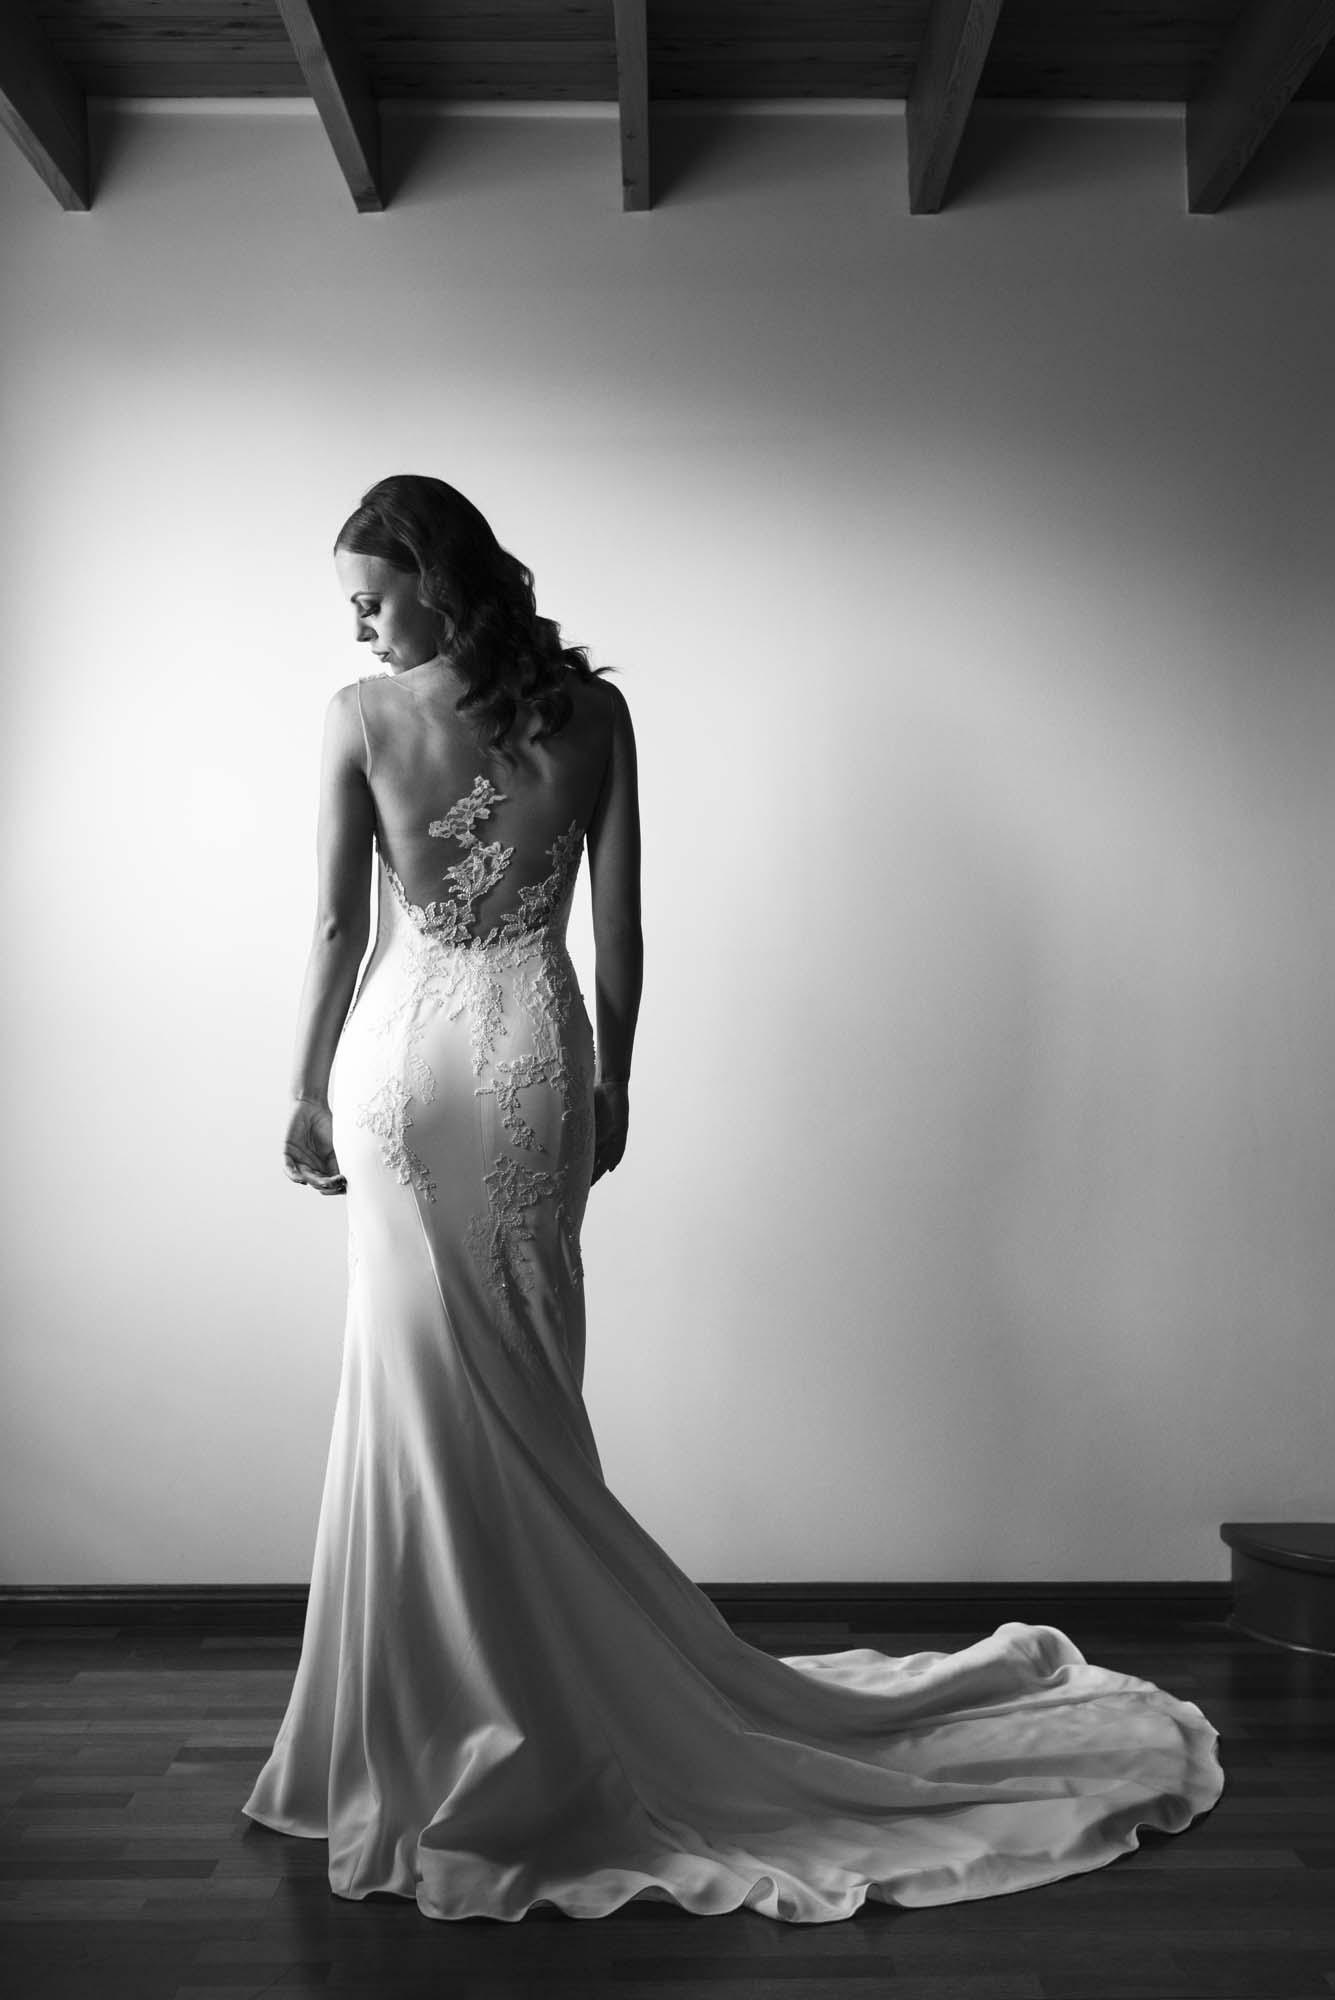 Mark Jay Sydney Wedding Photographer